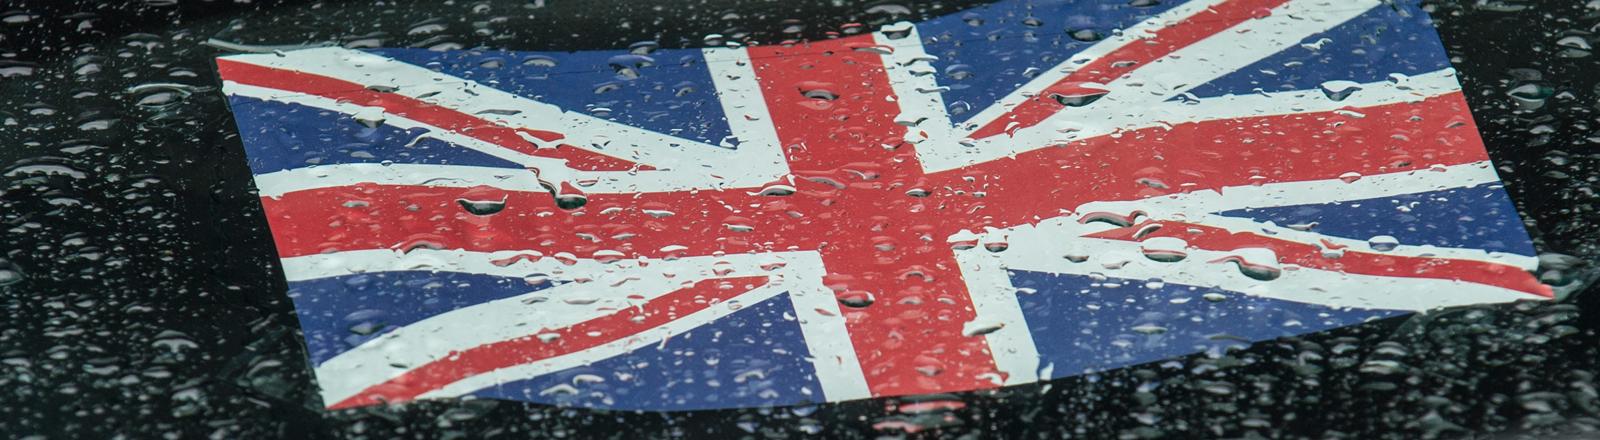 Brexit-Symbolbild